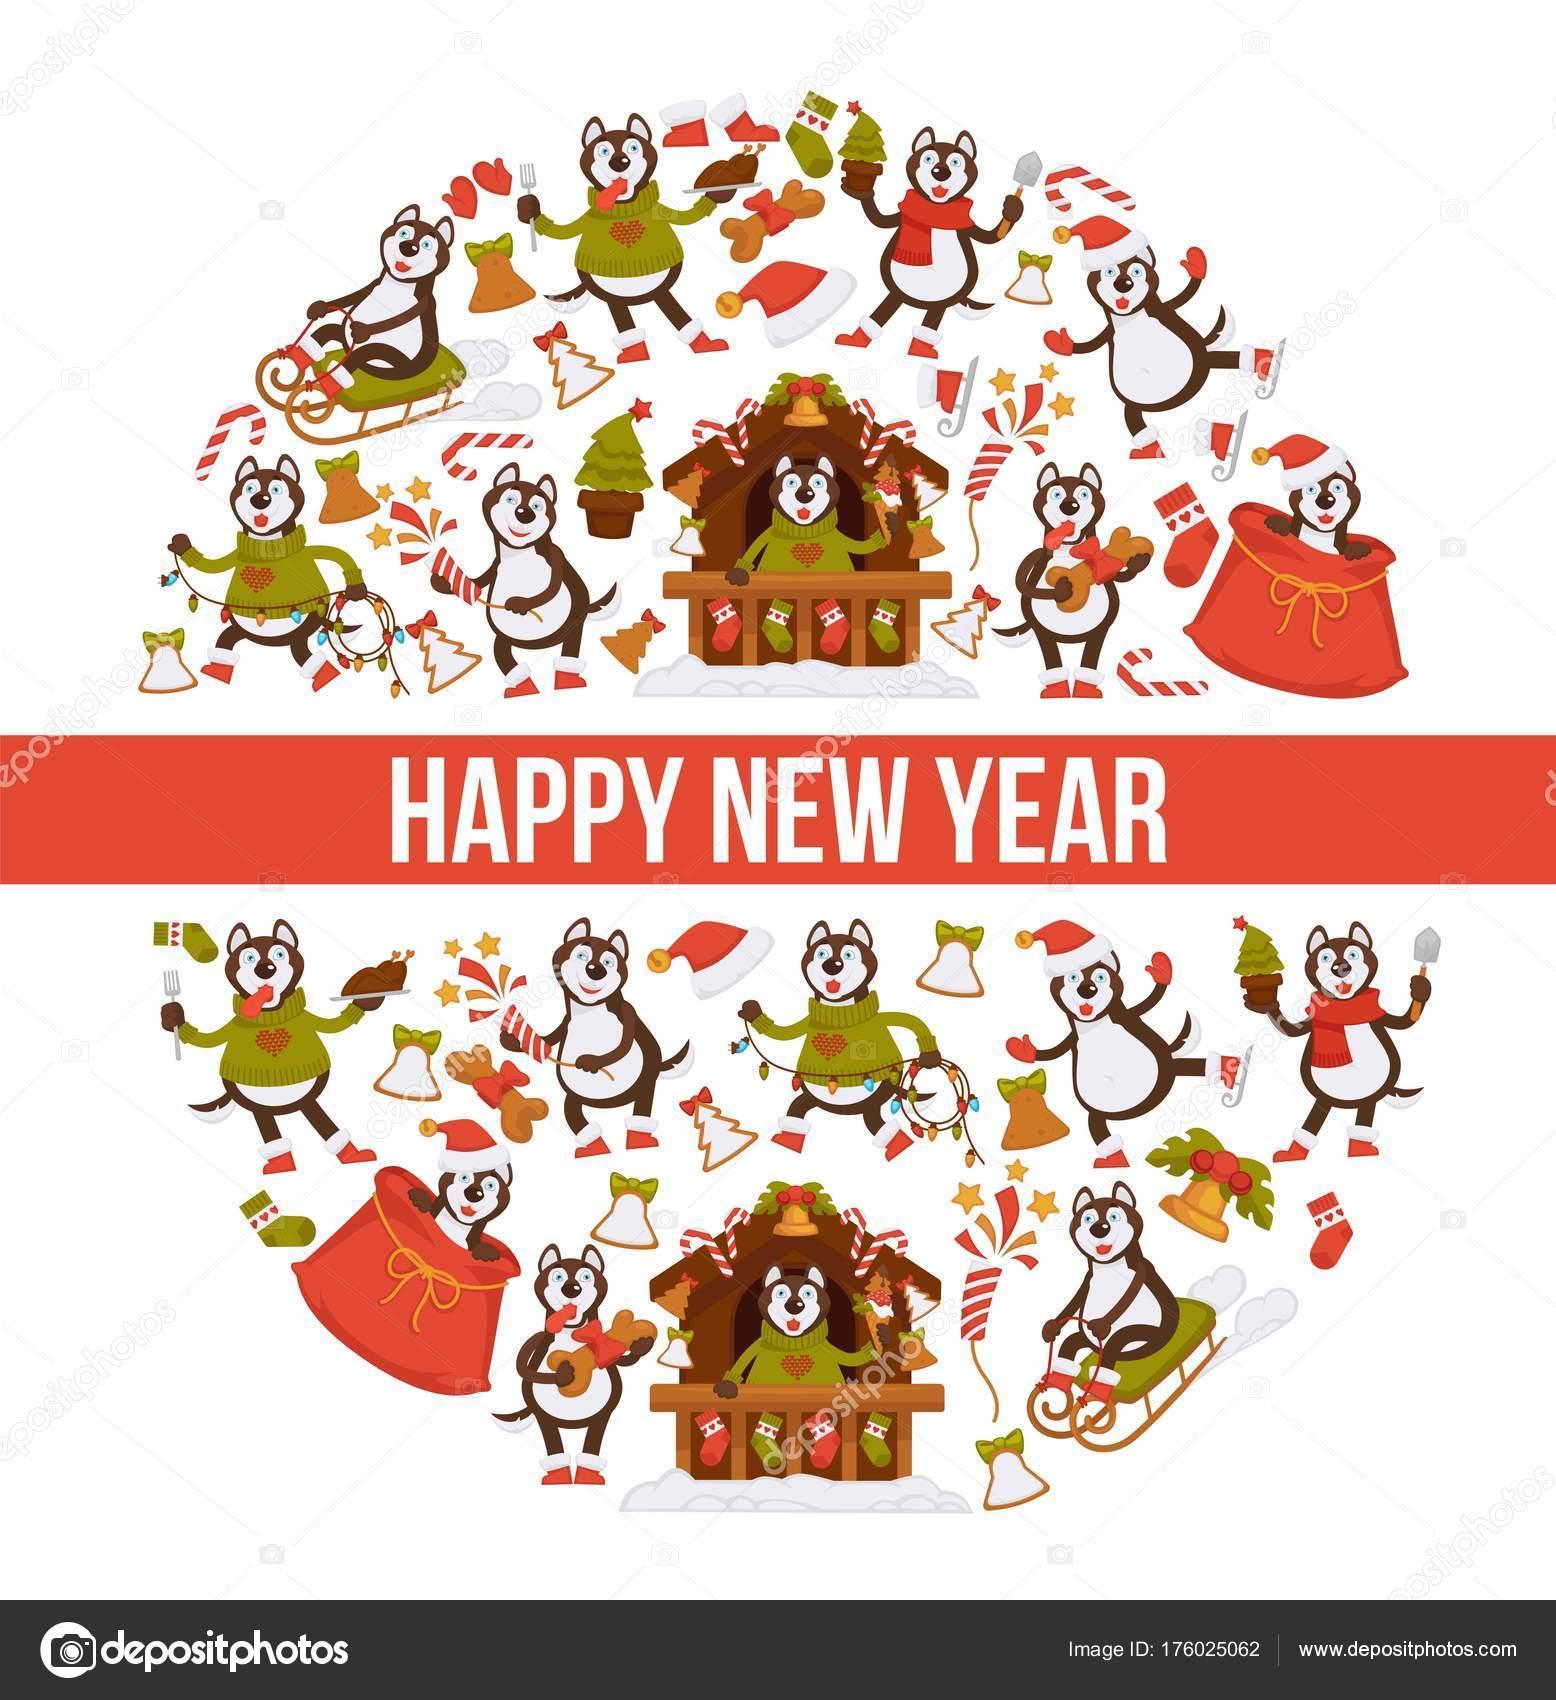 Stastny Novy Rok 2018 Pes Kreslene Pohlednice Sablona Navrhu Ikony